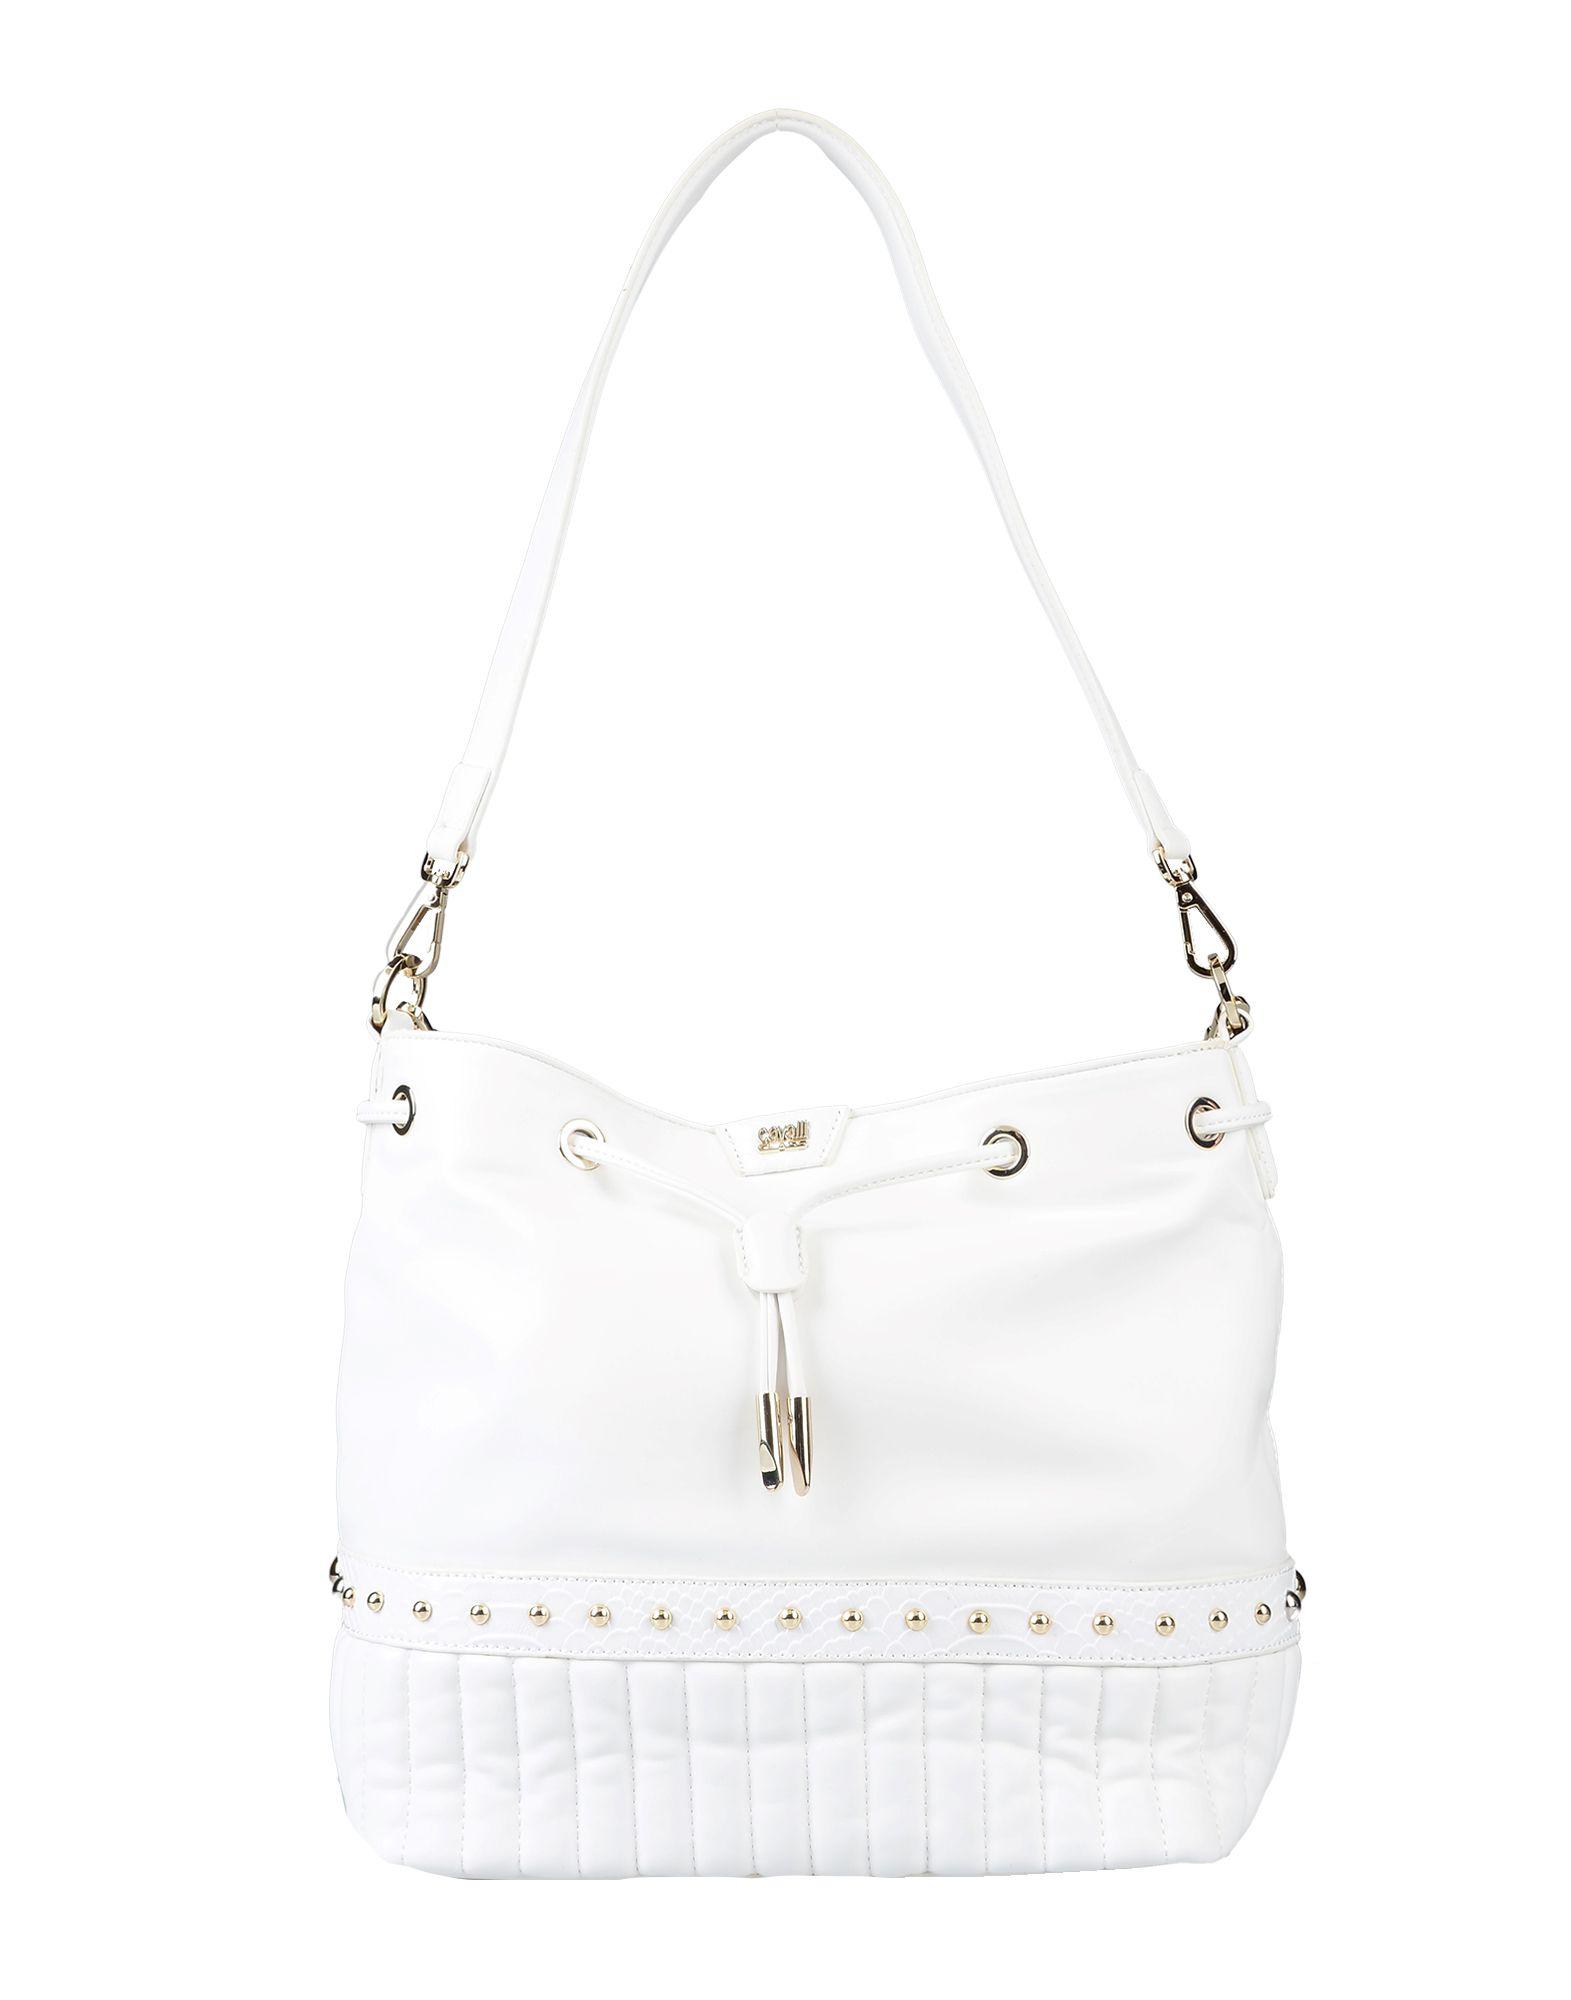 timeless design 9e05a 427e2 Shoulder Bag in White